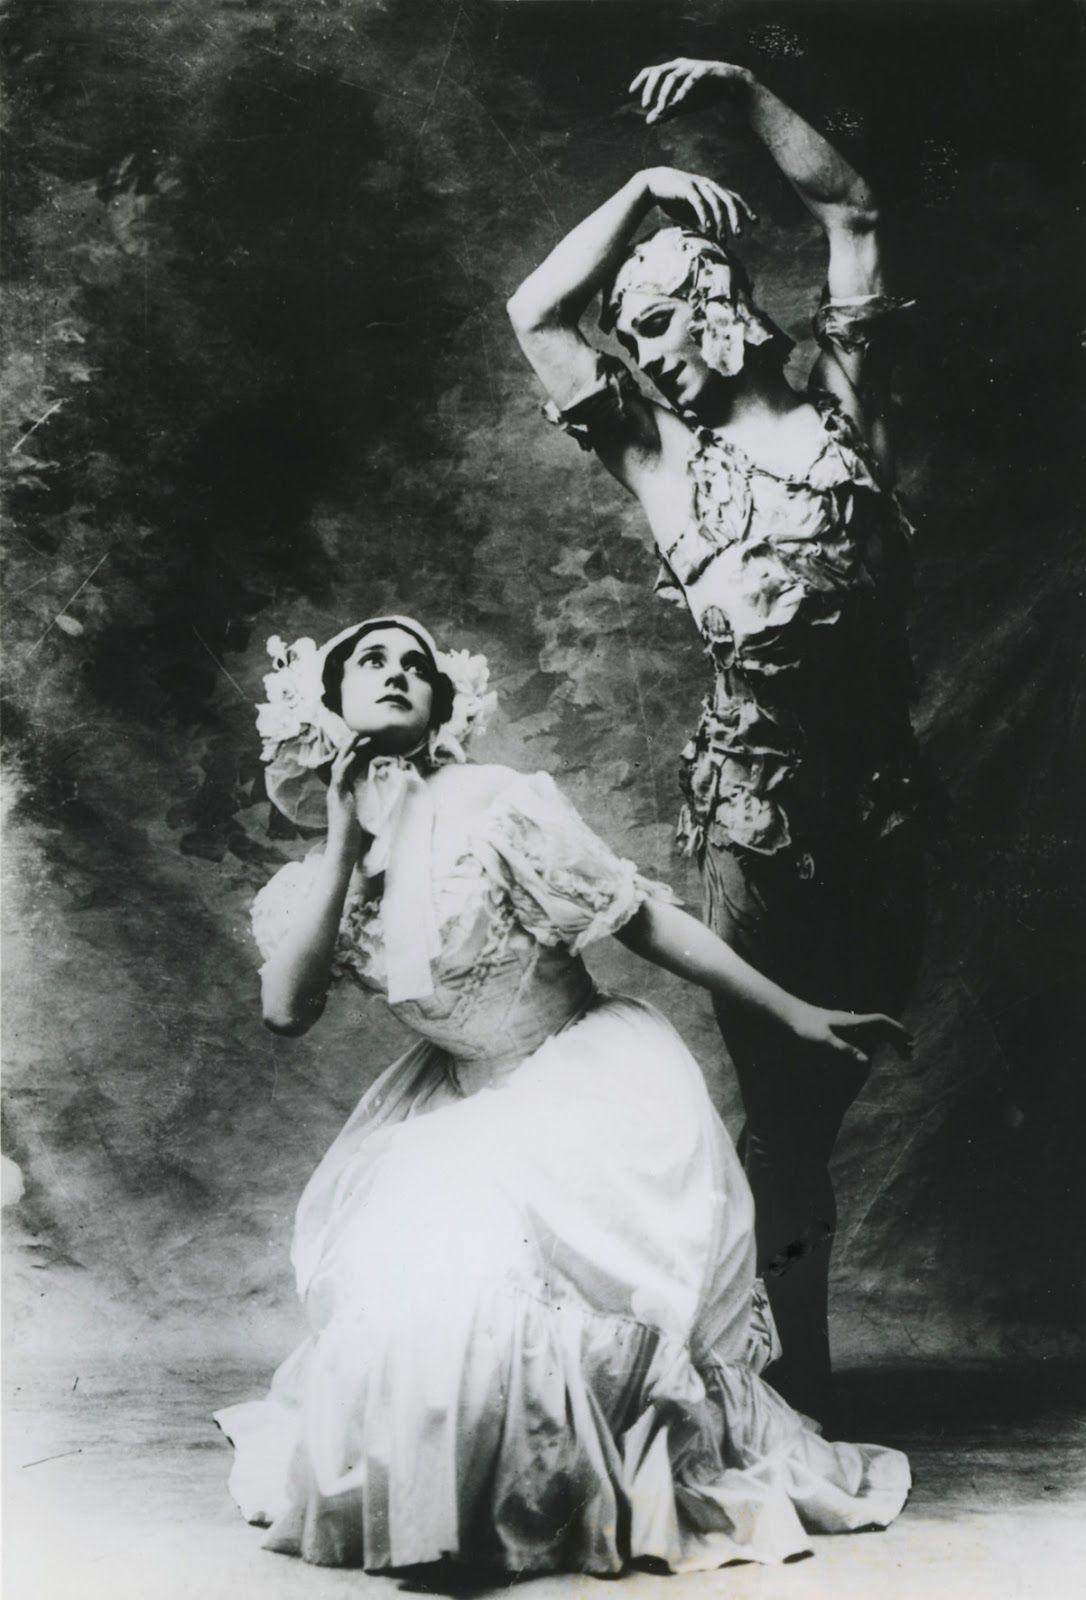 Karsavina and Nijinsky in 'Le Spectre de la Rose'. Oh, to have been in the room...